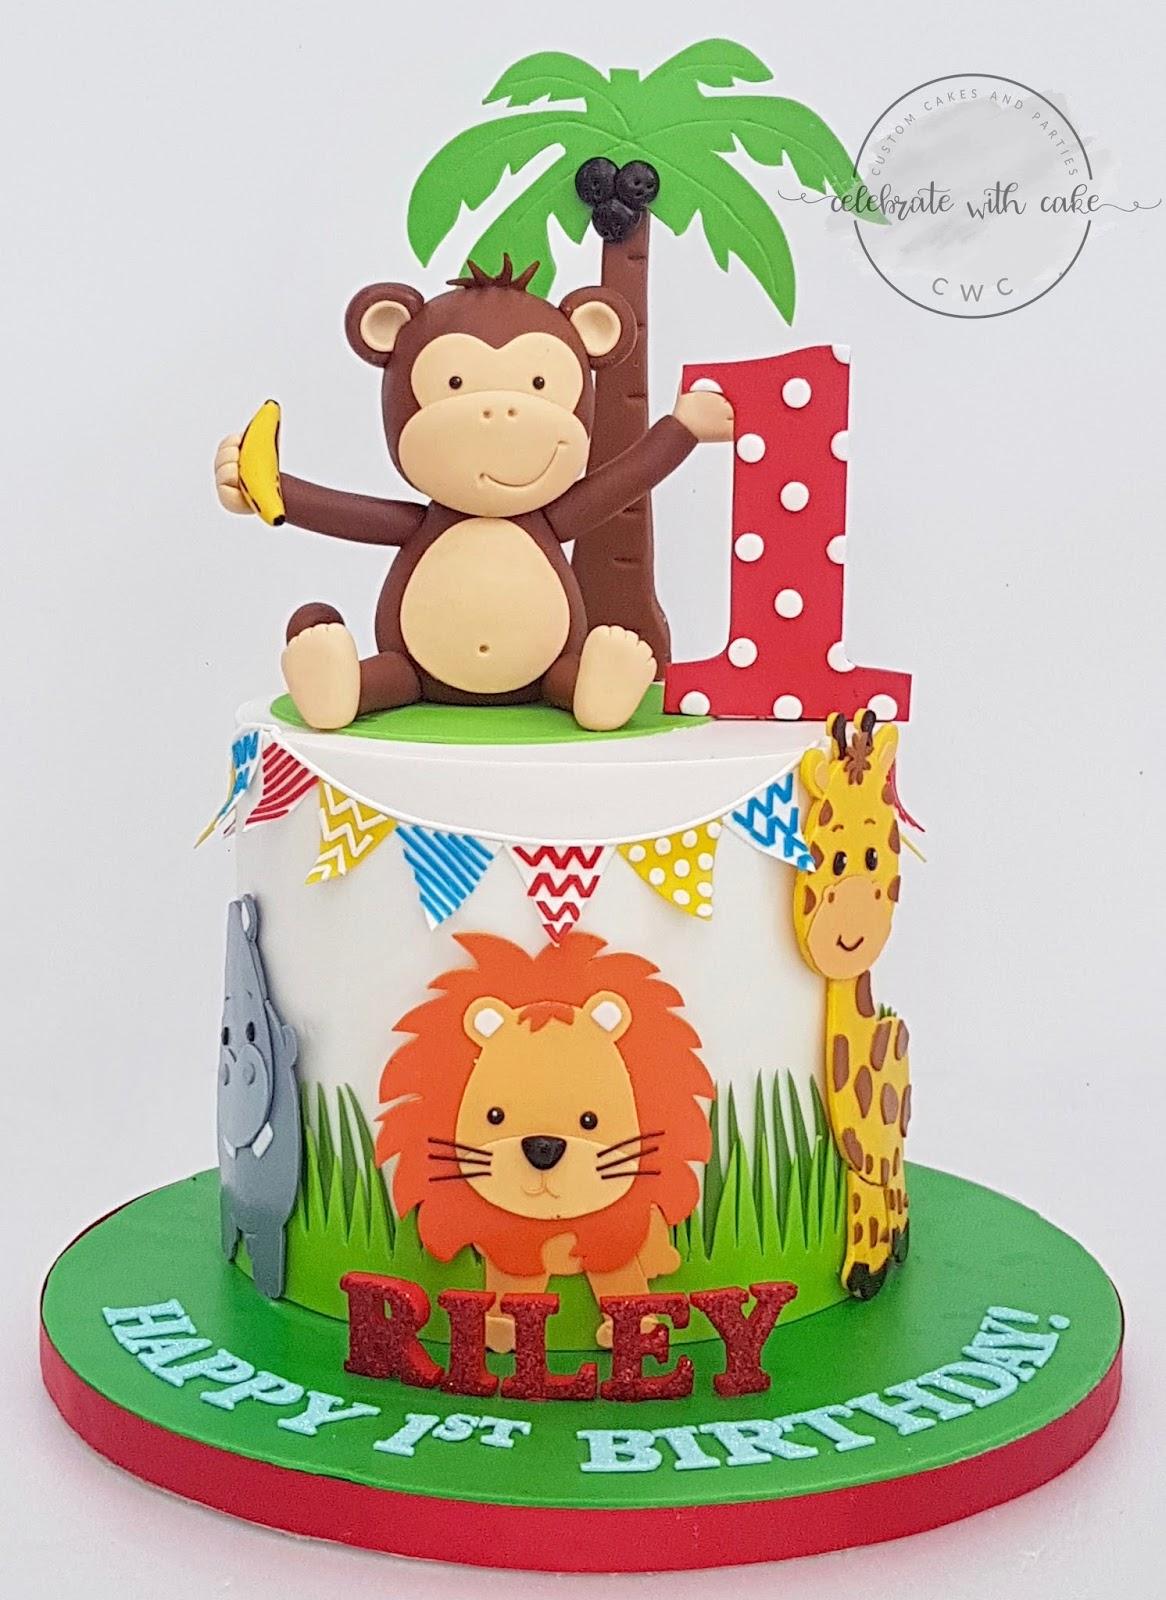 Celebrate With Cake Safari 1st Birthday Single Tier